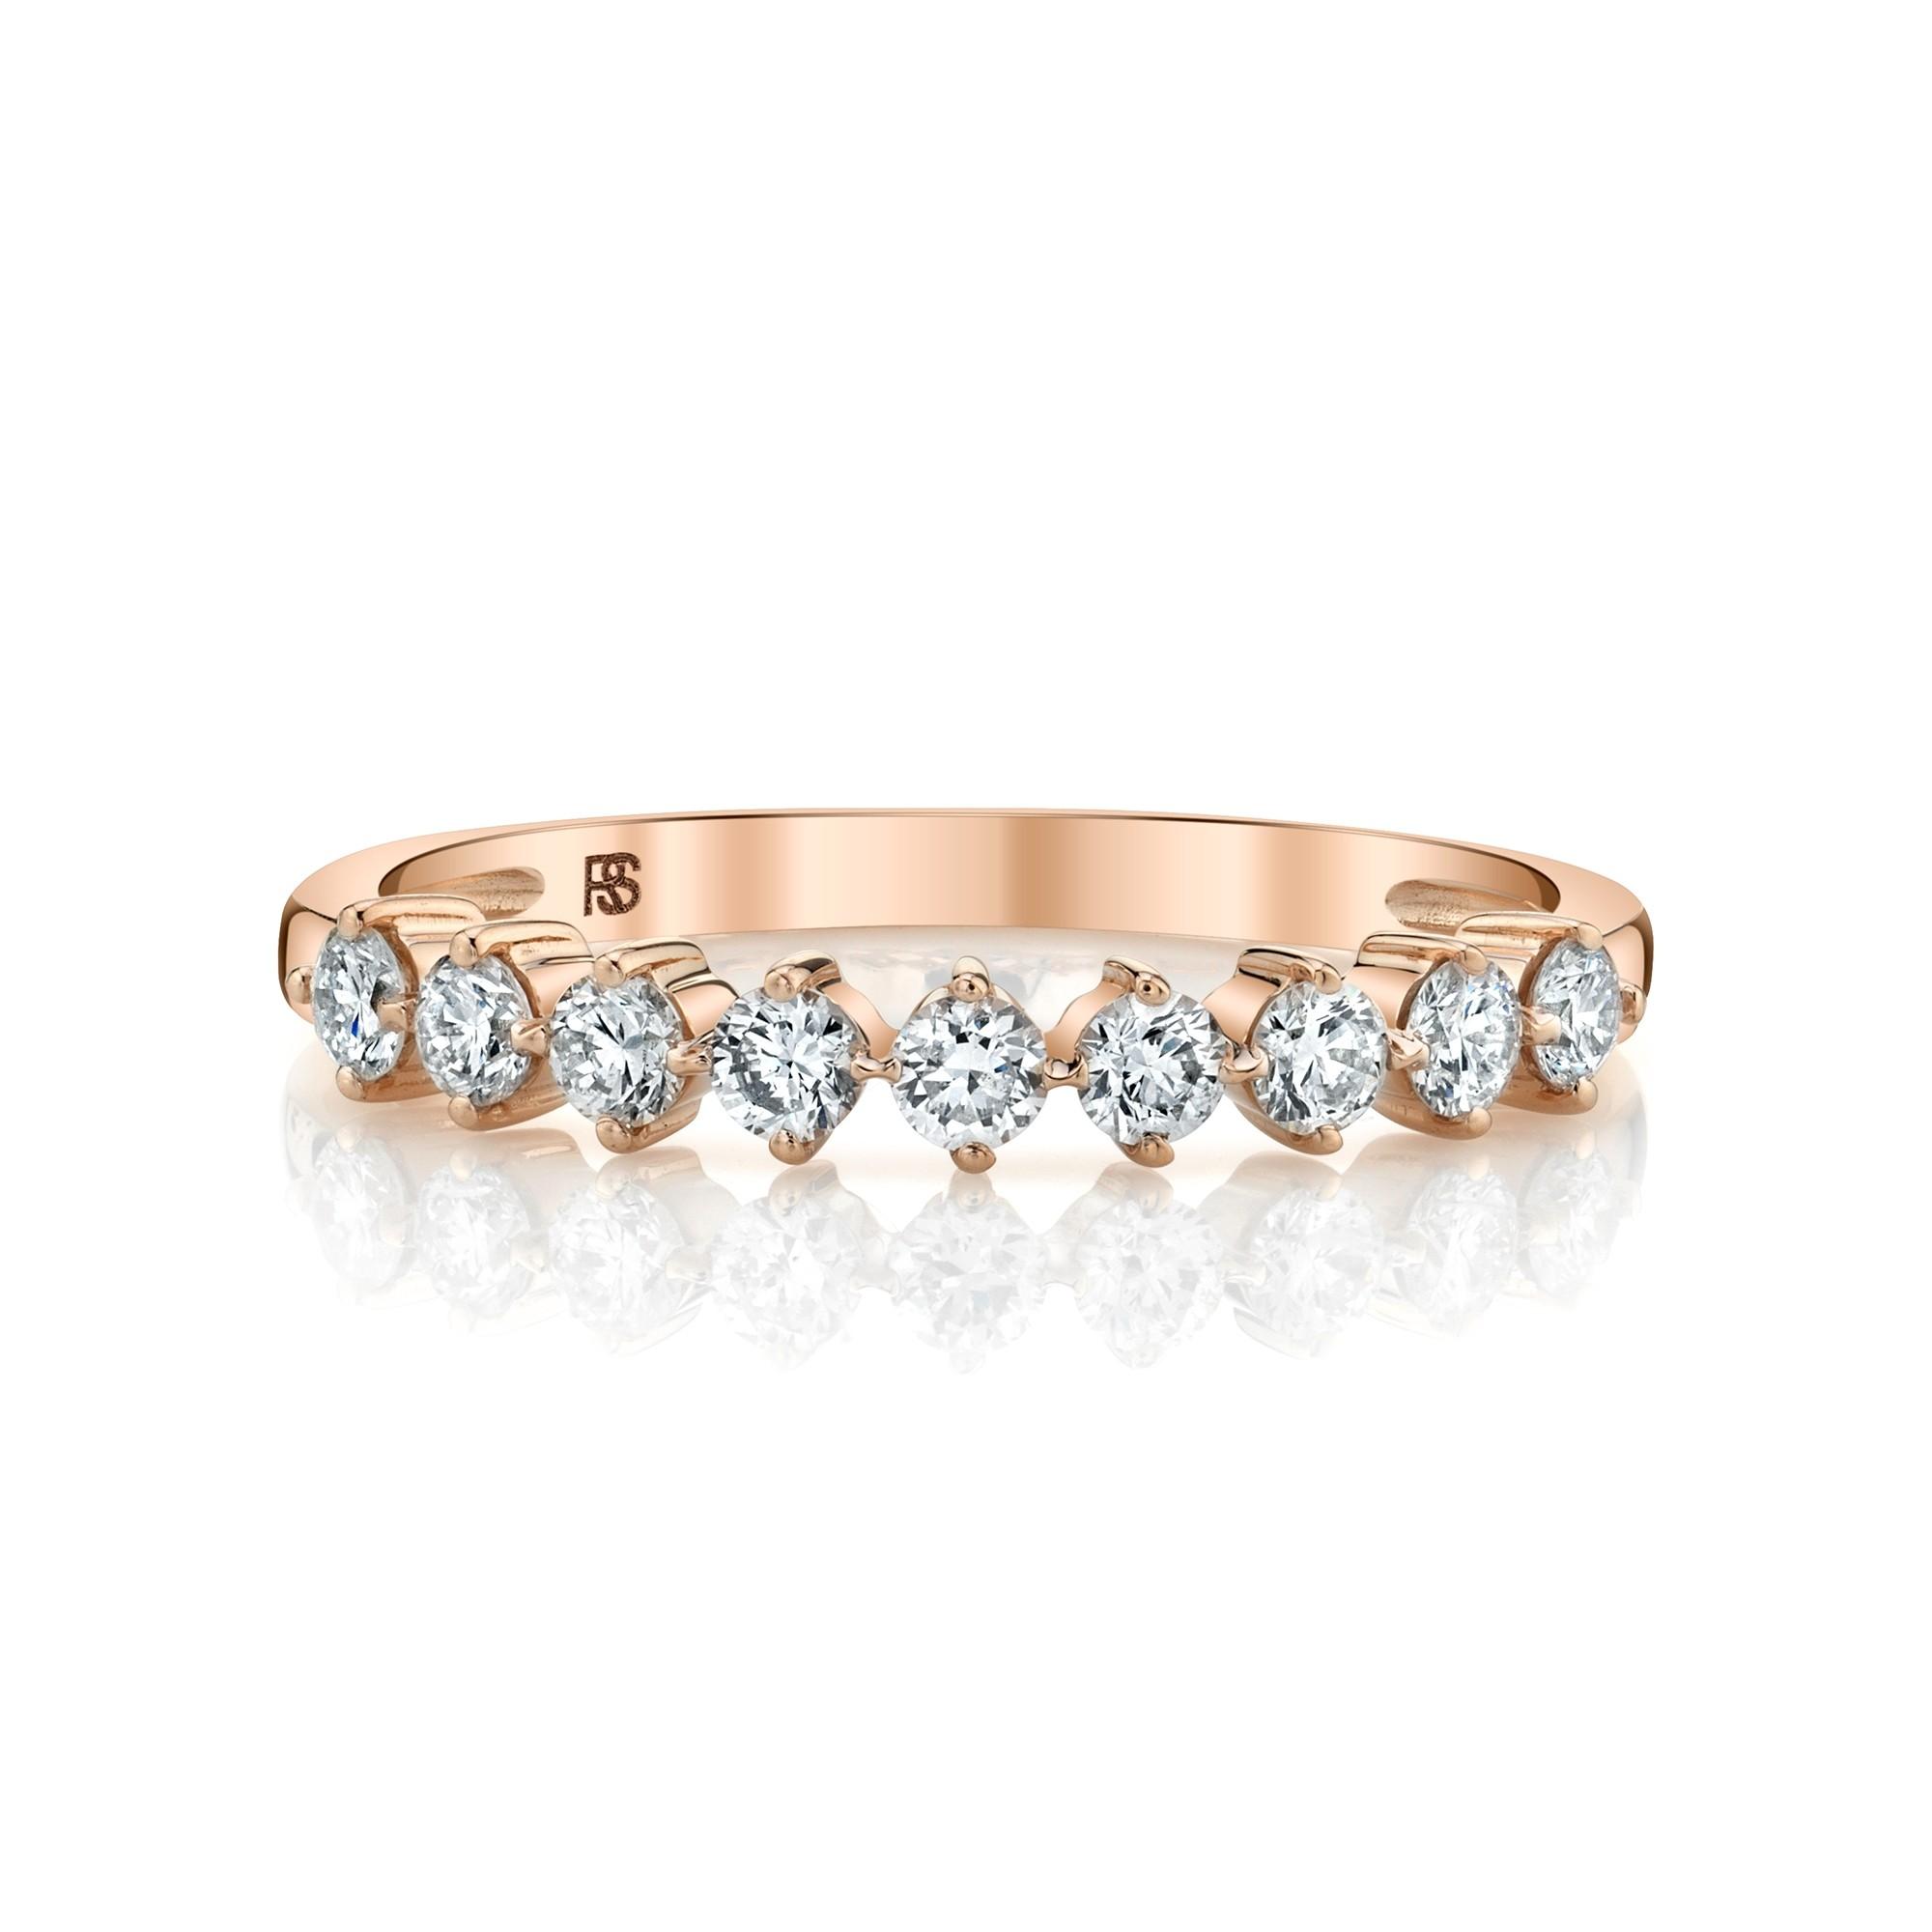 14k Rose Gold Diamond Compass Set Ring 2